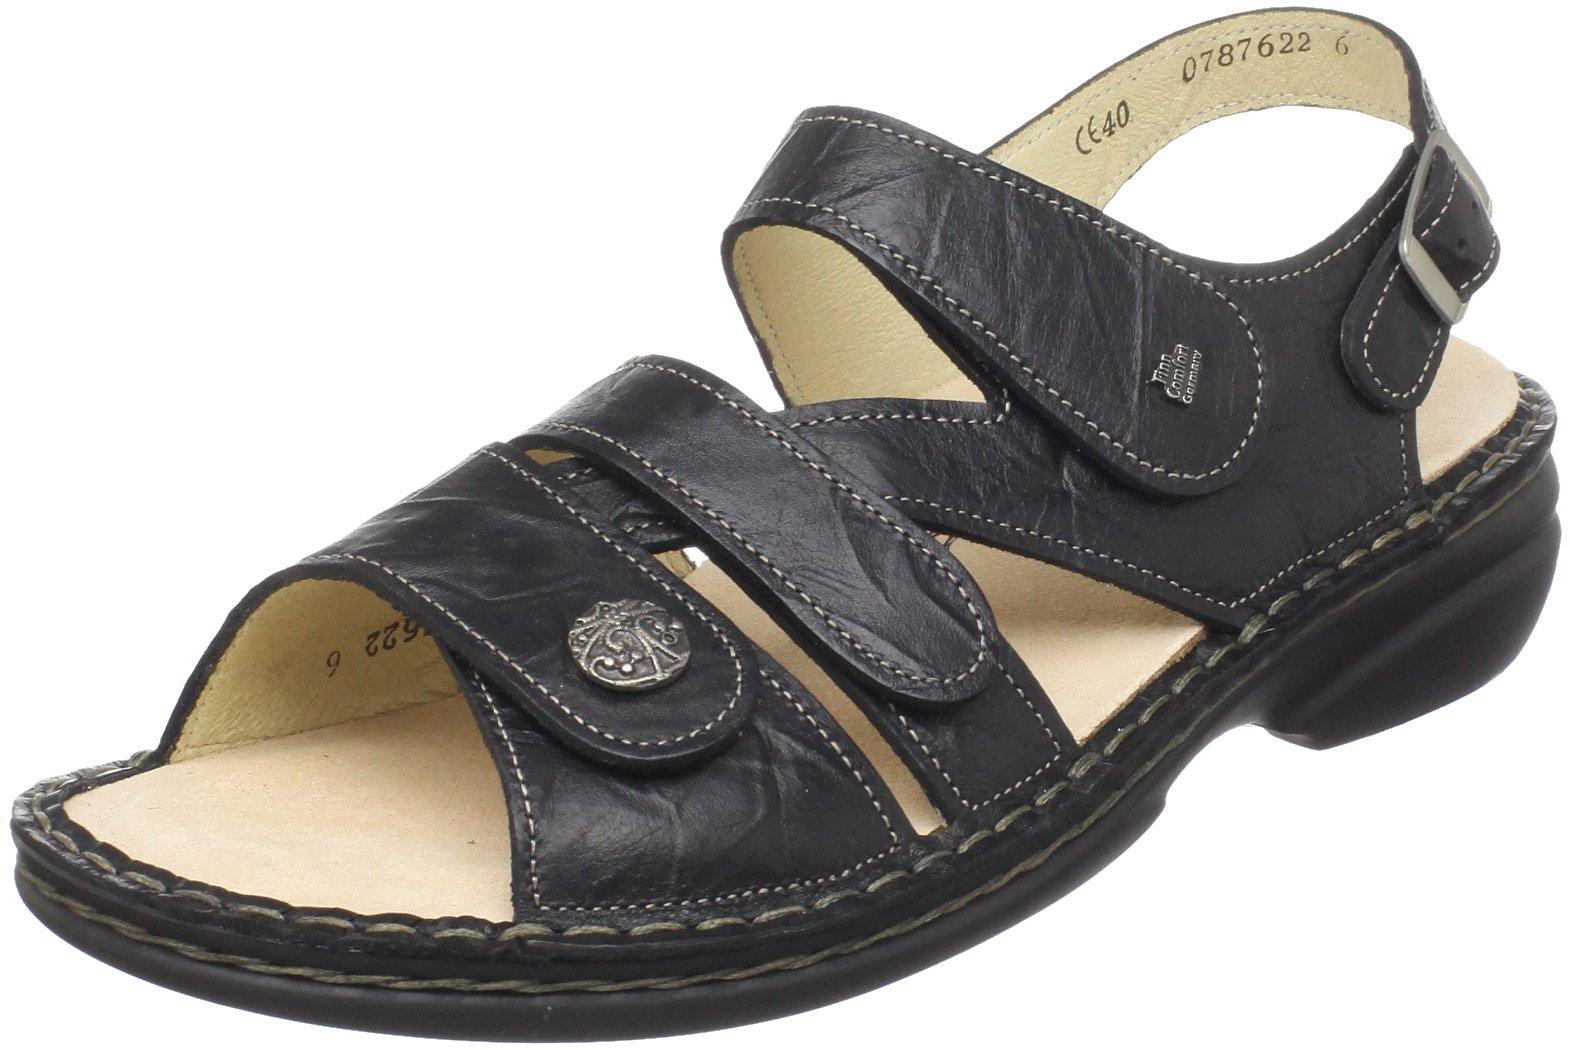 Finn Comfort Women's Gomera Ankle-Strap Sandal,Black Plisseelight,42 EU/11 M US by Finn Comfort (Image #1)